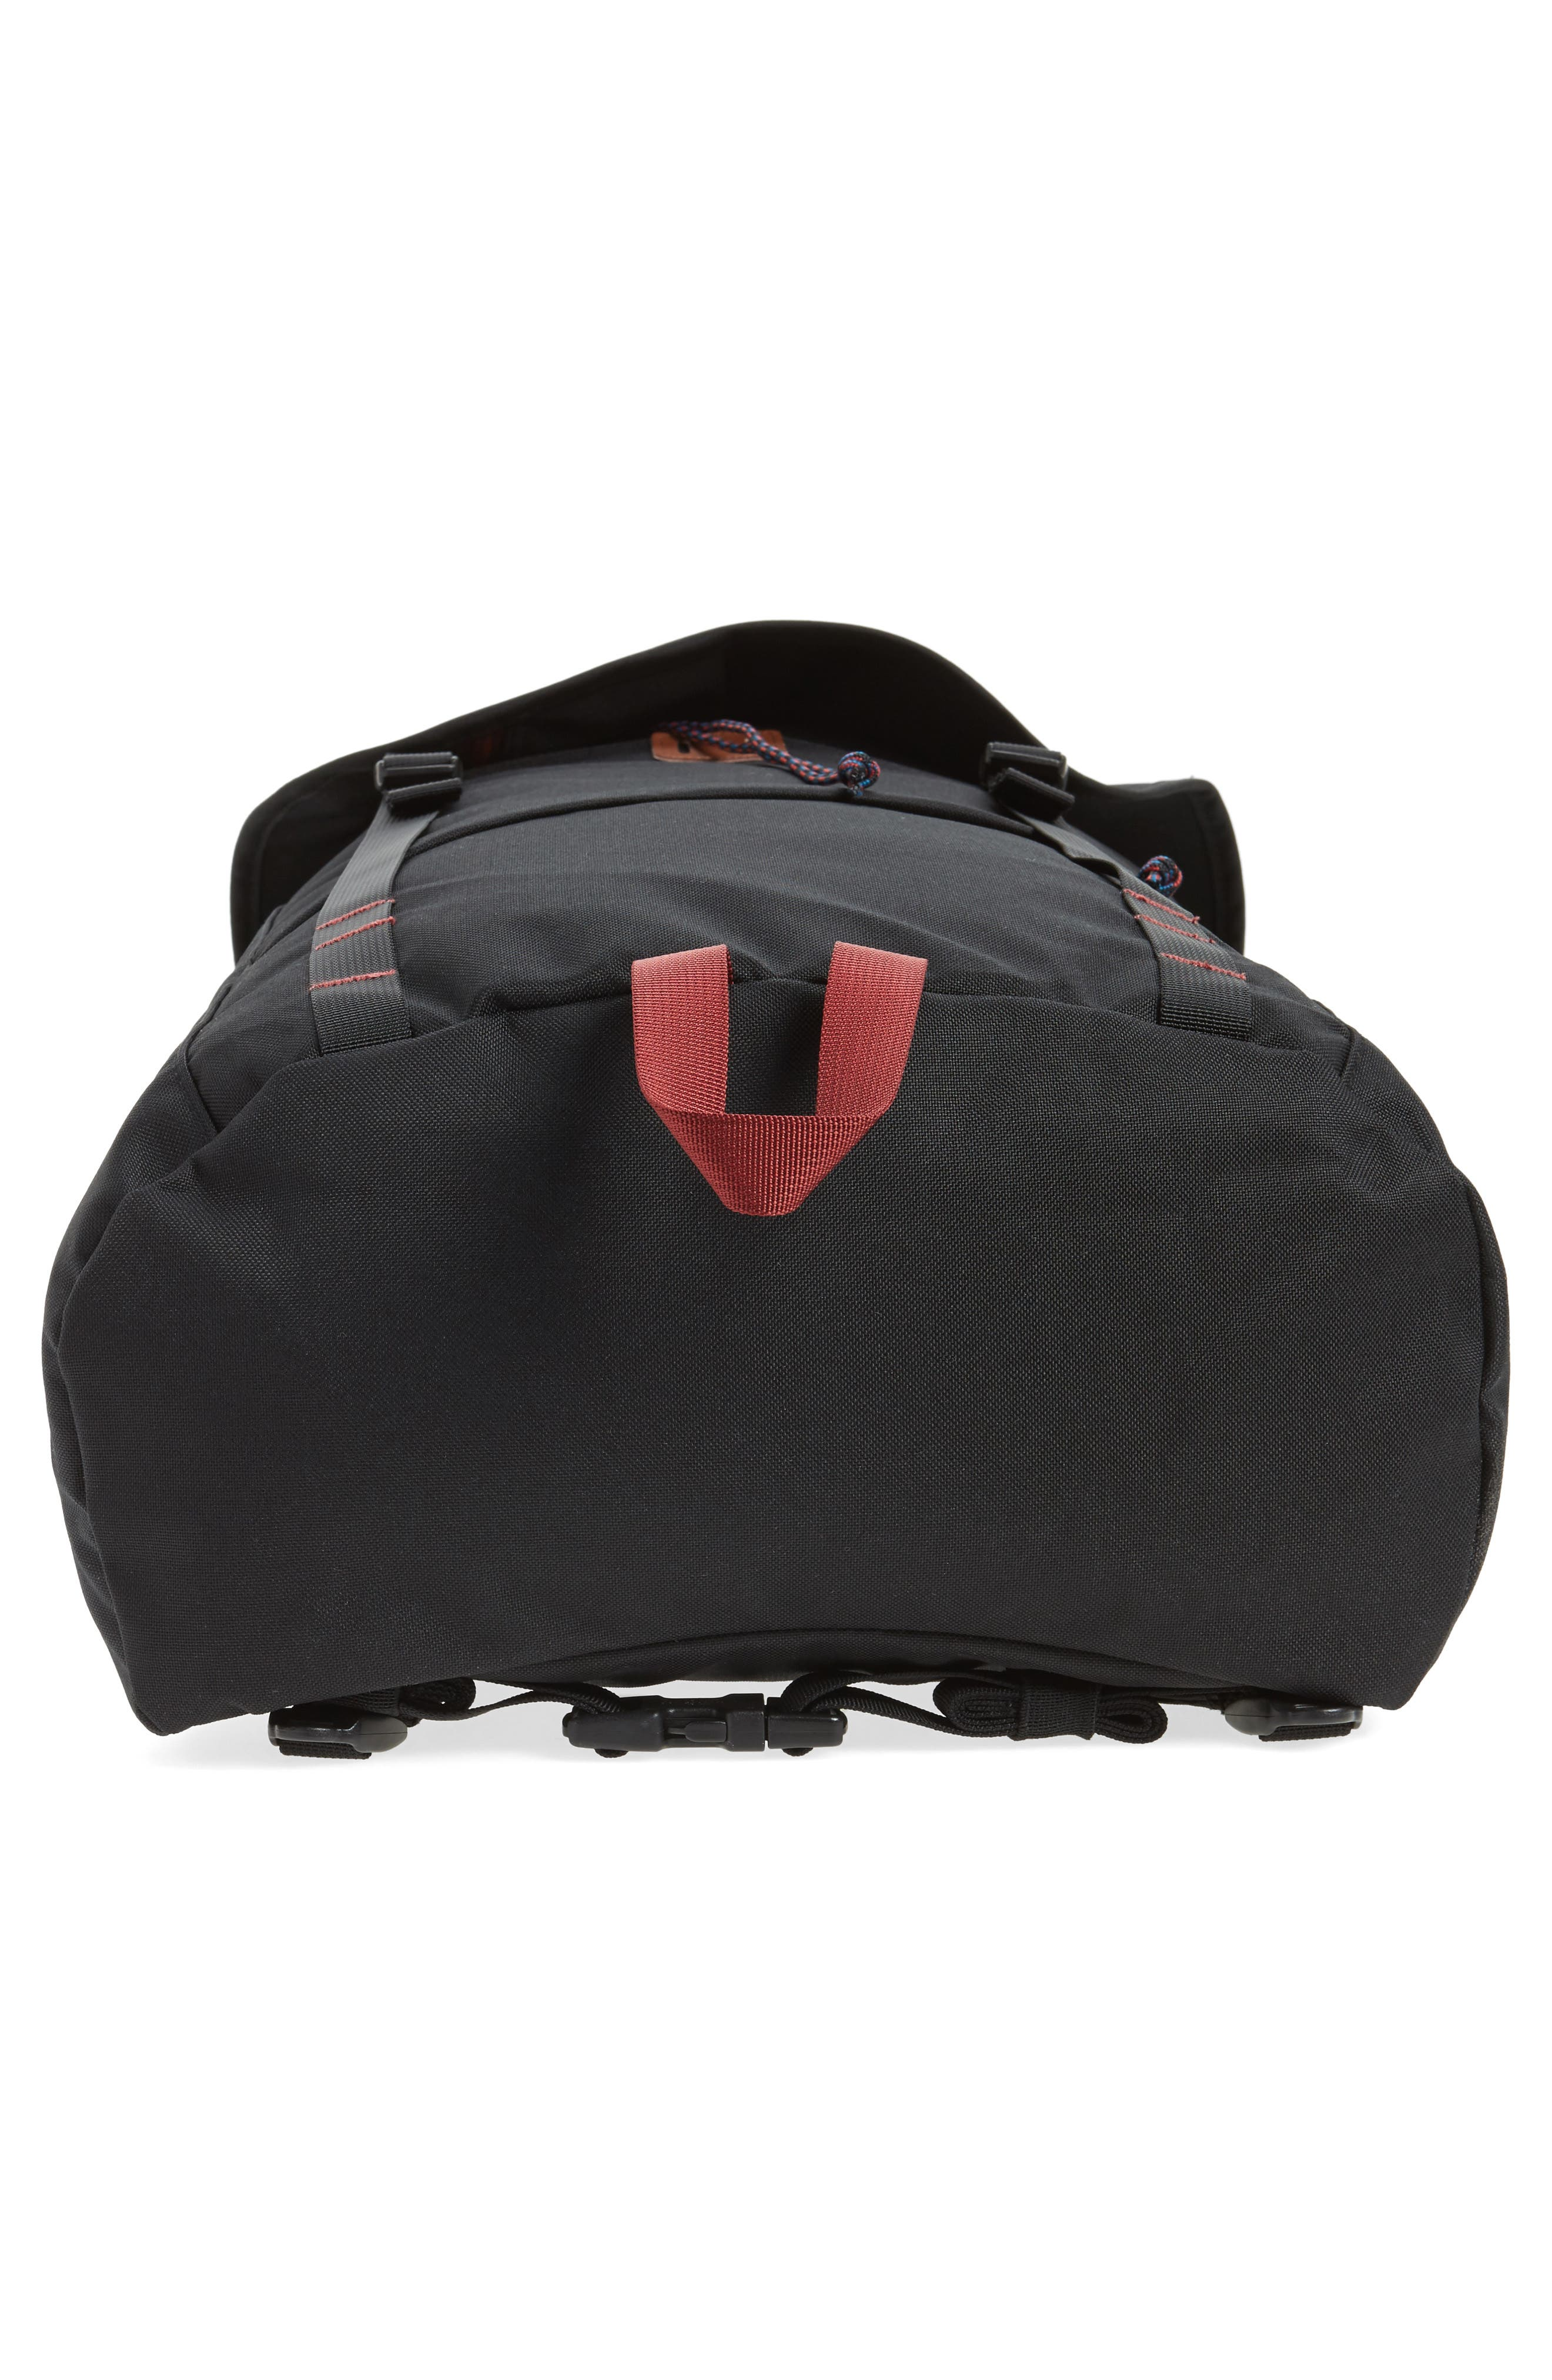 PATAGONIA, Arbor 26-Liter Backpack, Alternate thumbnail 6, color, 001